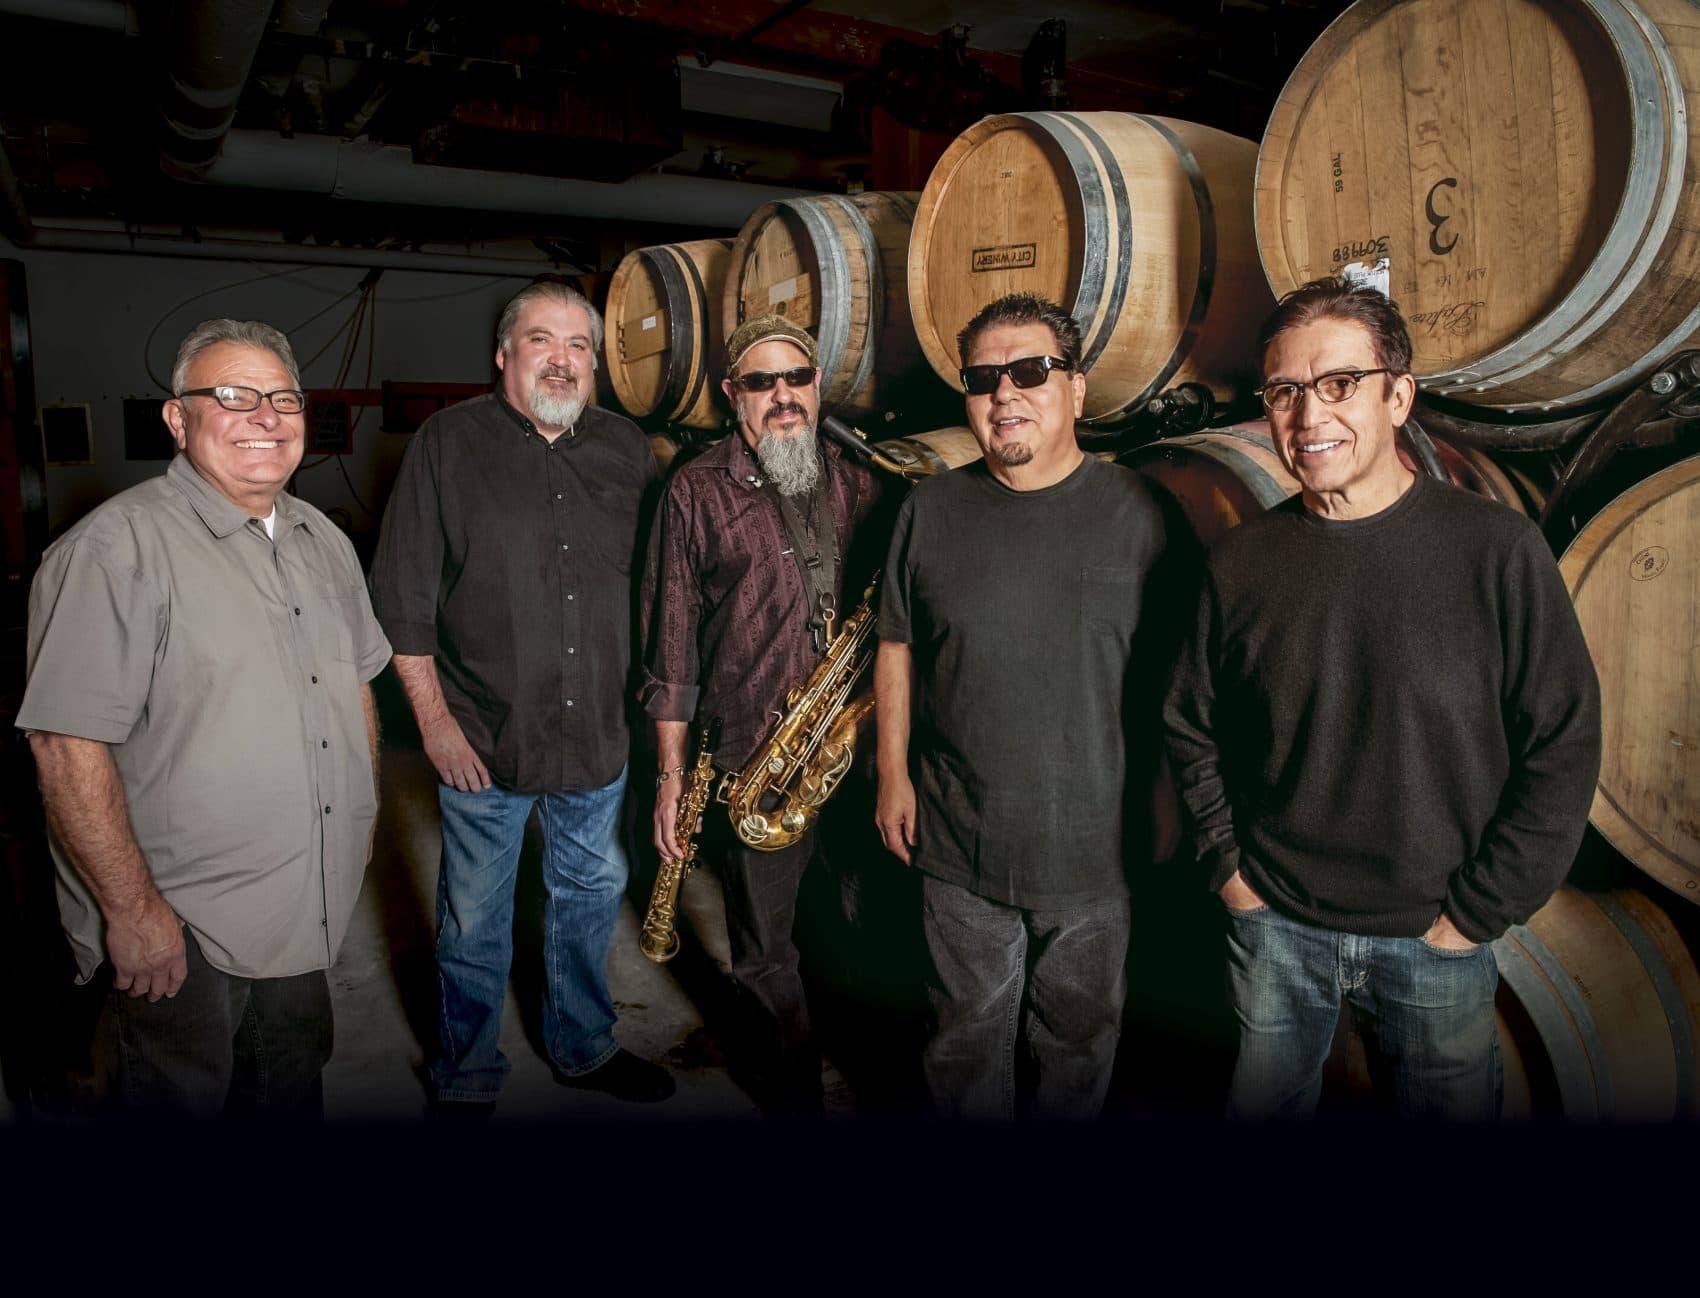 Los Lobos backstage at City Winery. (Courtesy City Winery)